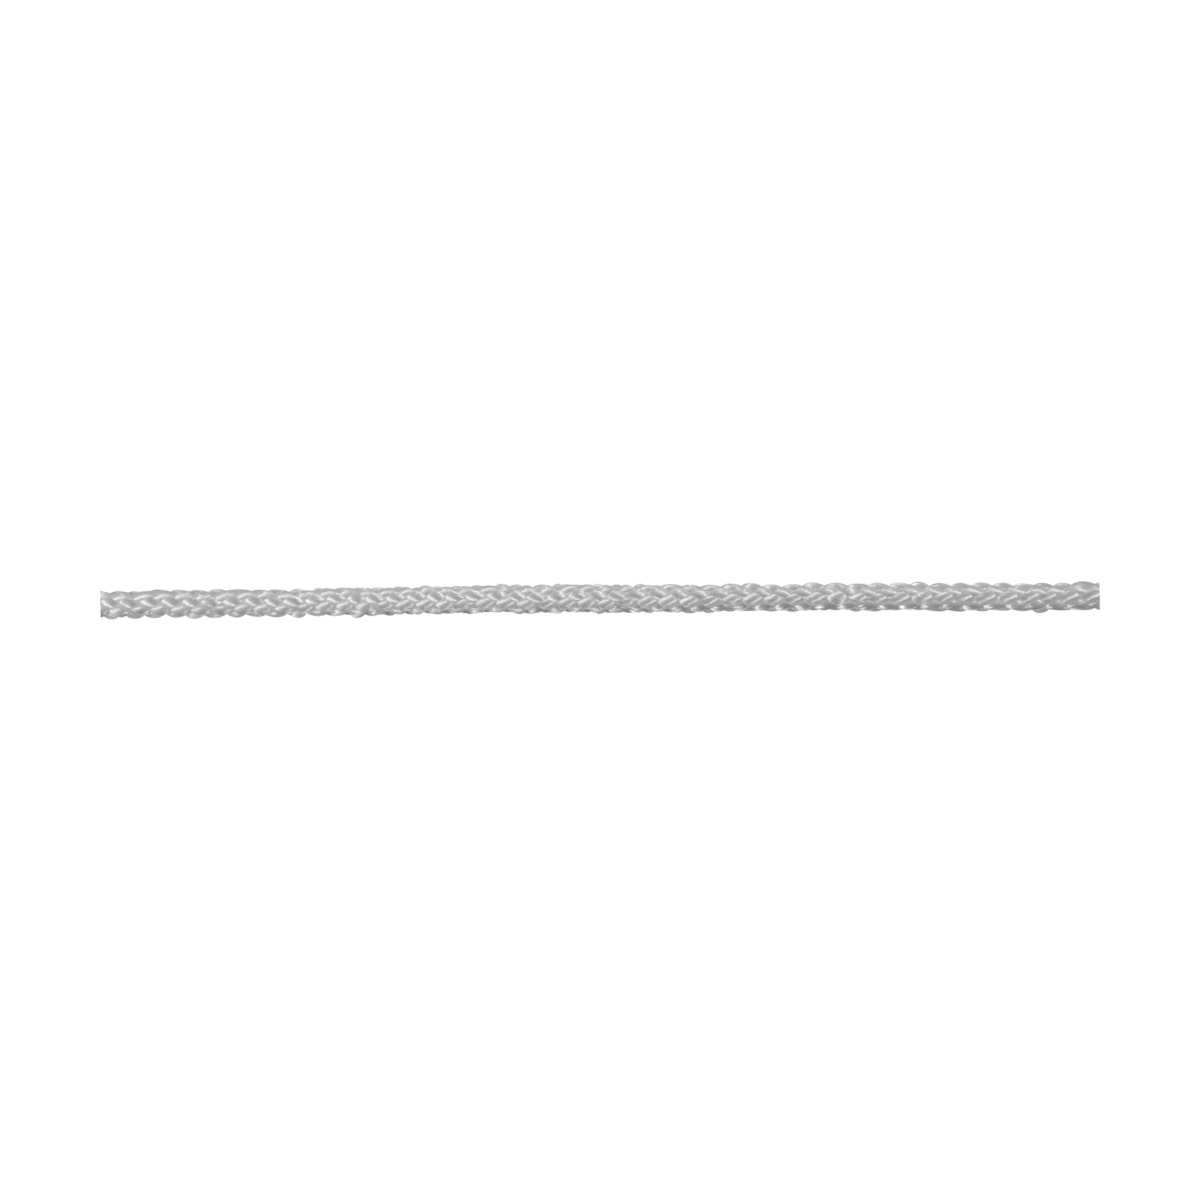 Nylon Starting Rope - White - 3/16-in x 50-ft